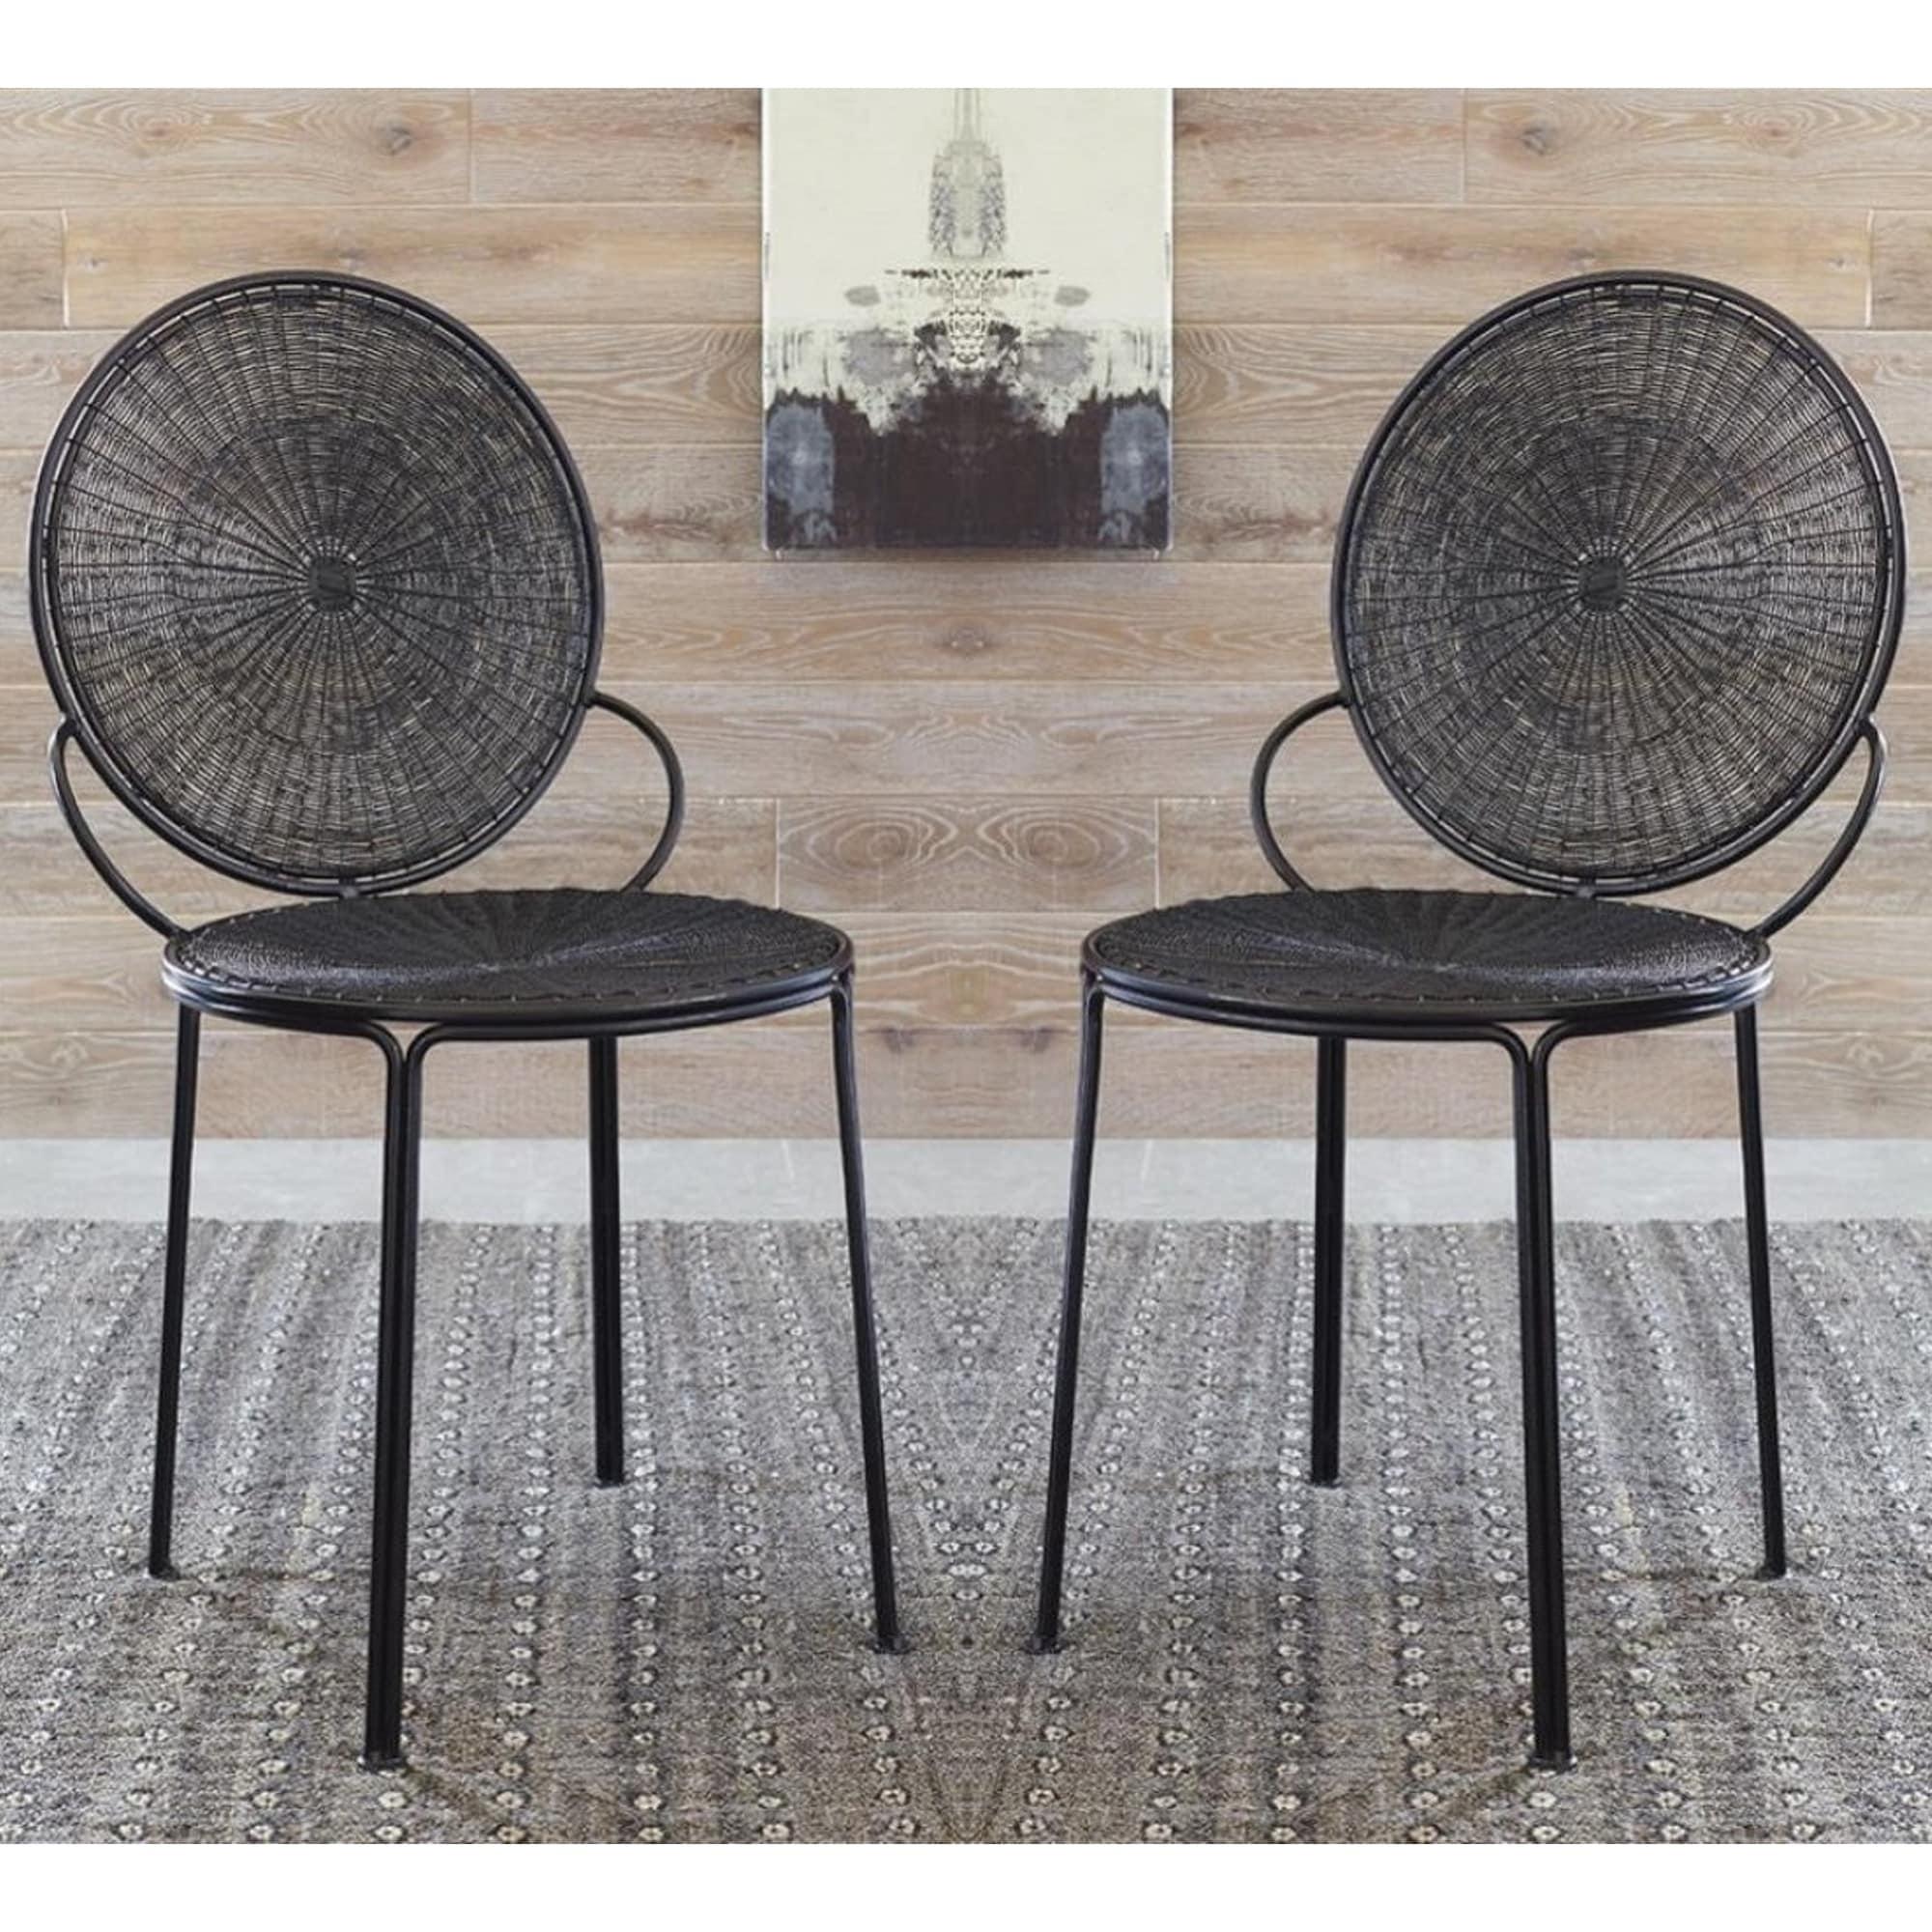 Modern Web Design Black Iron Accent Chairs (Set Of 2)